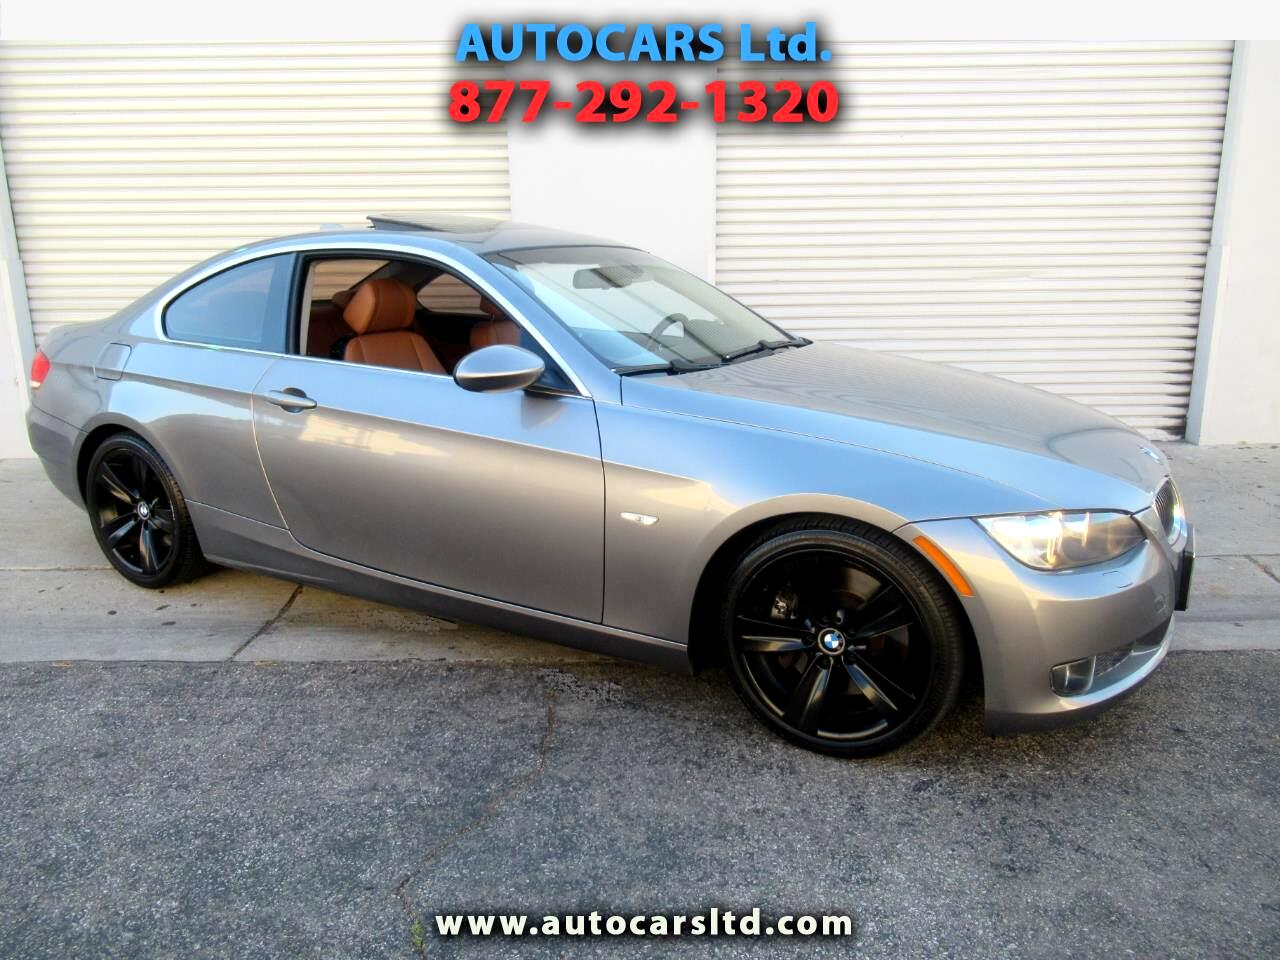 BMW 3 Series 2dr Cpe 335i RWD 2007